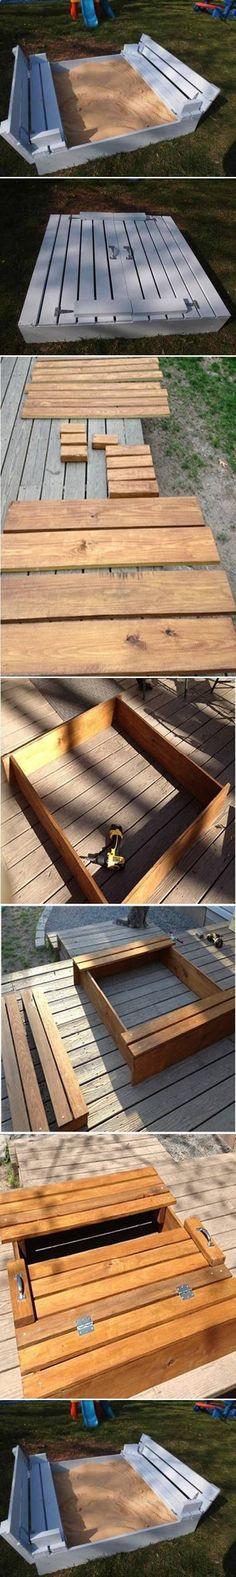 DIY Sandbox...thats pretty neat